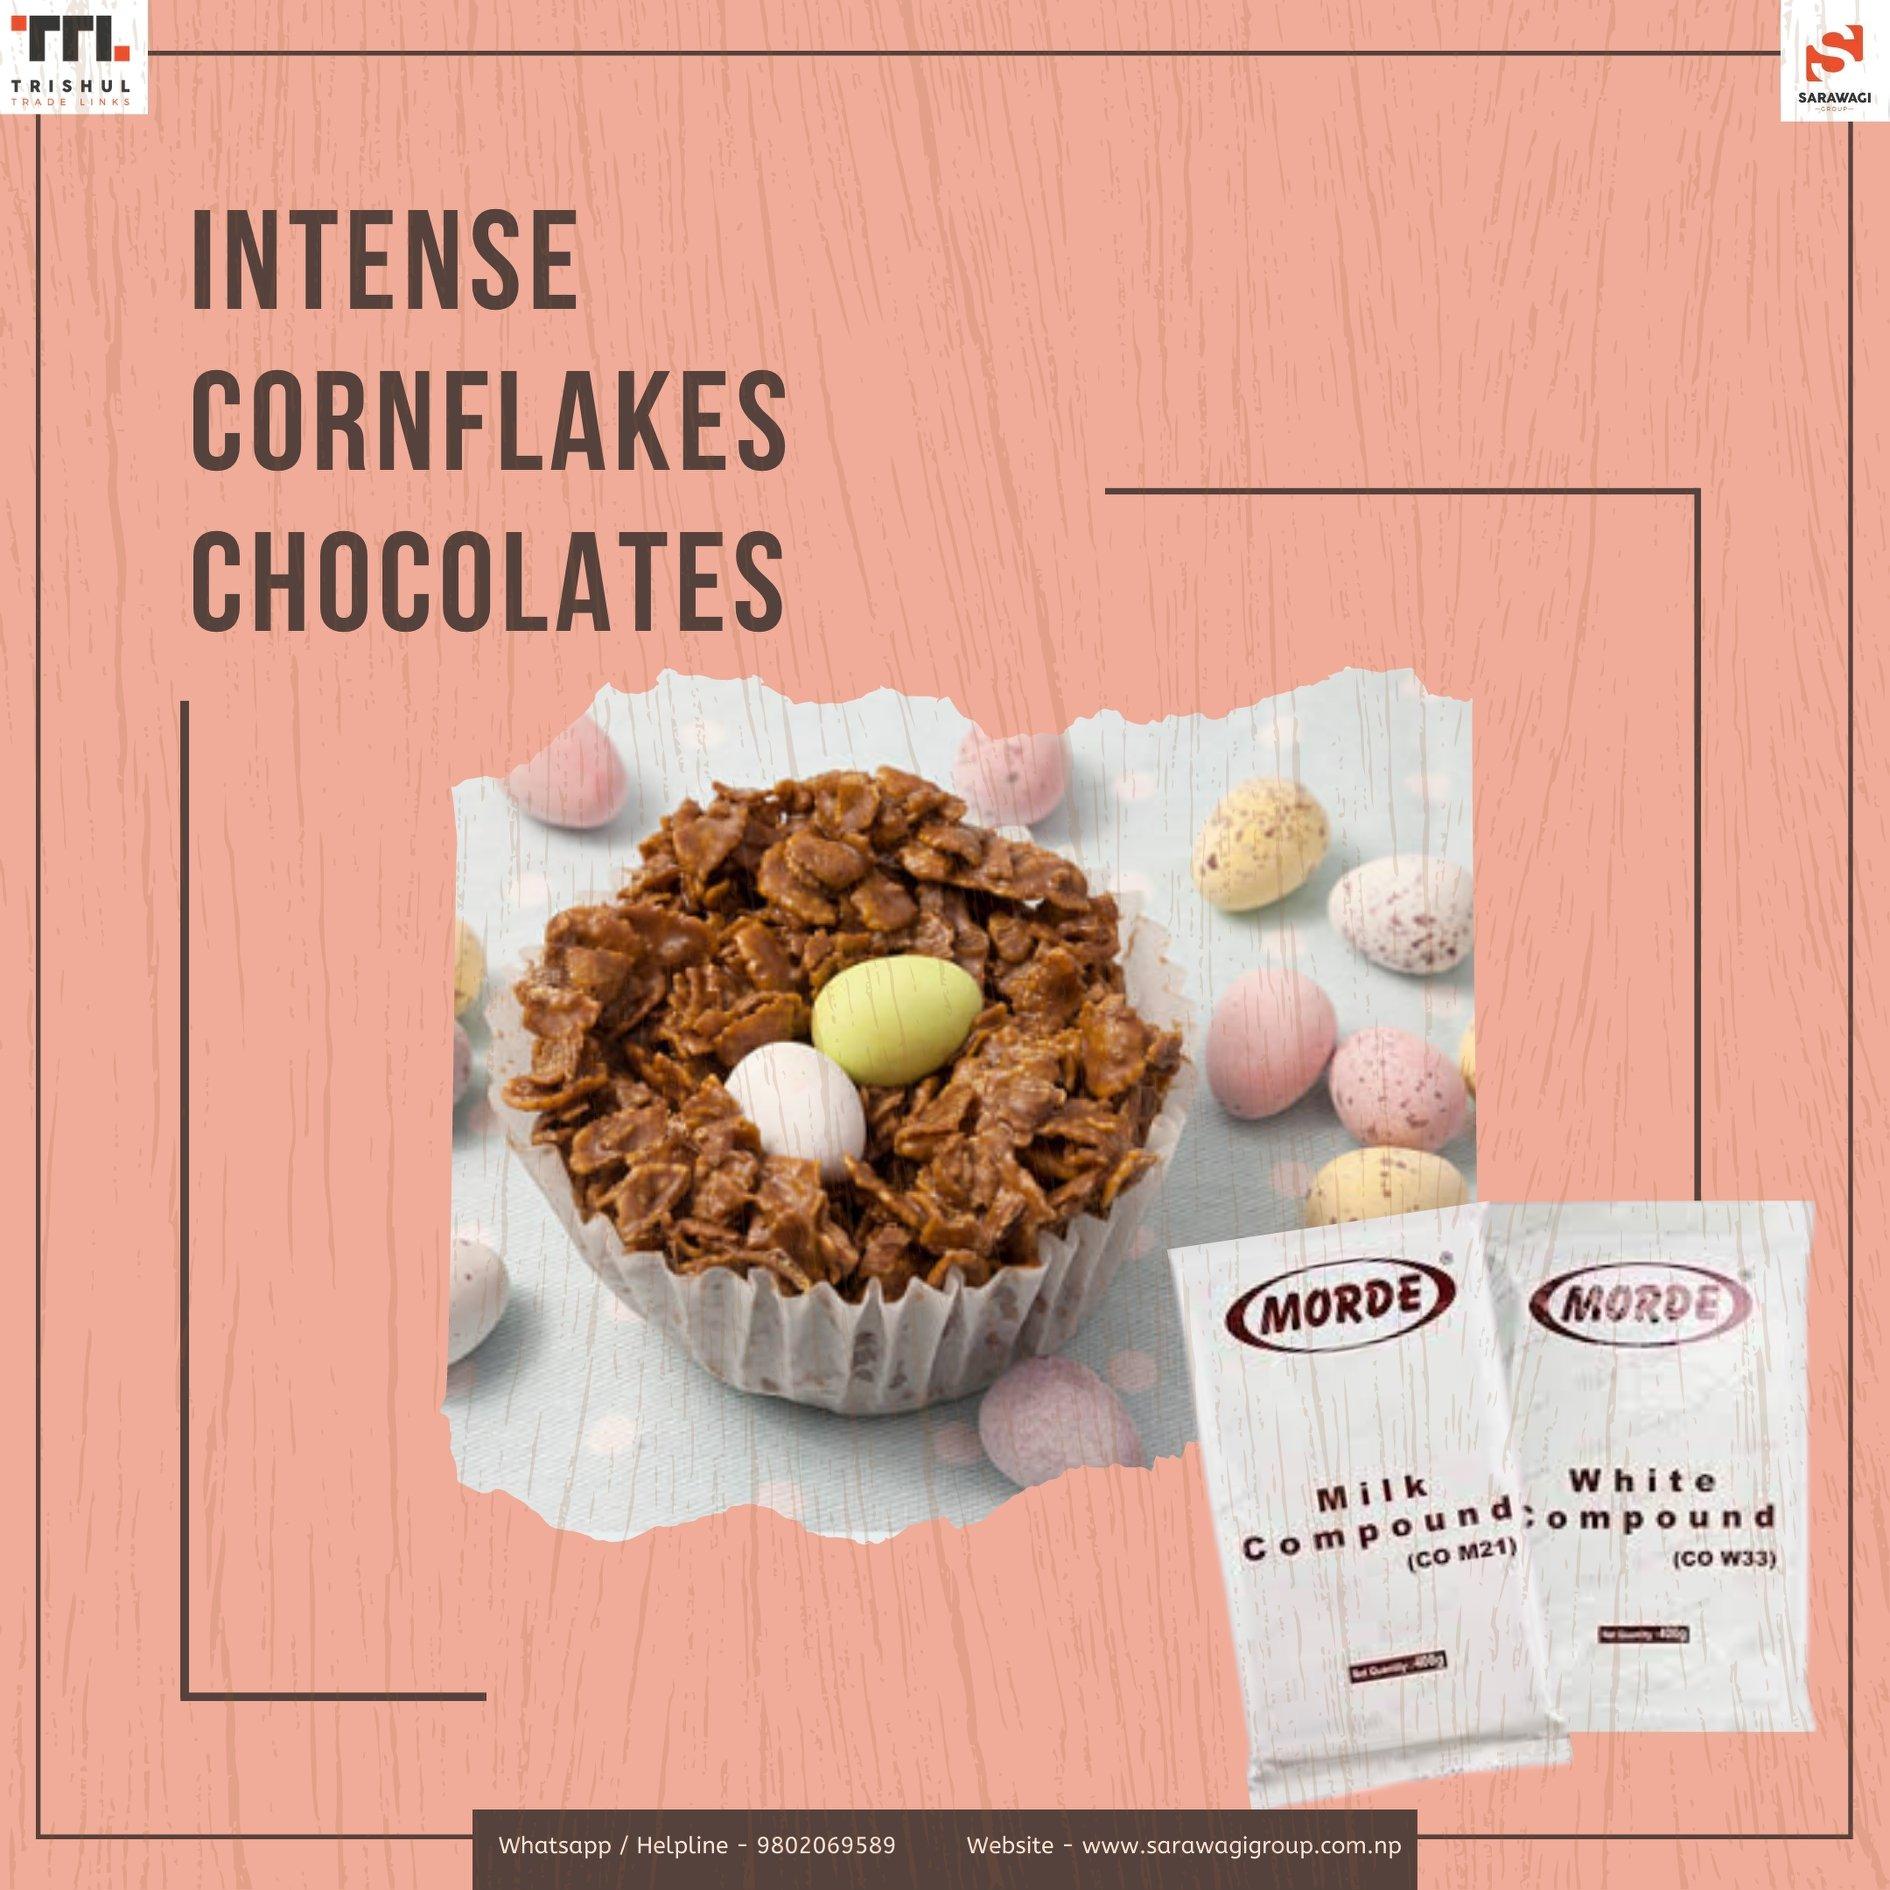 Intense Cornflakes Chocolate Image